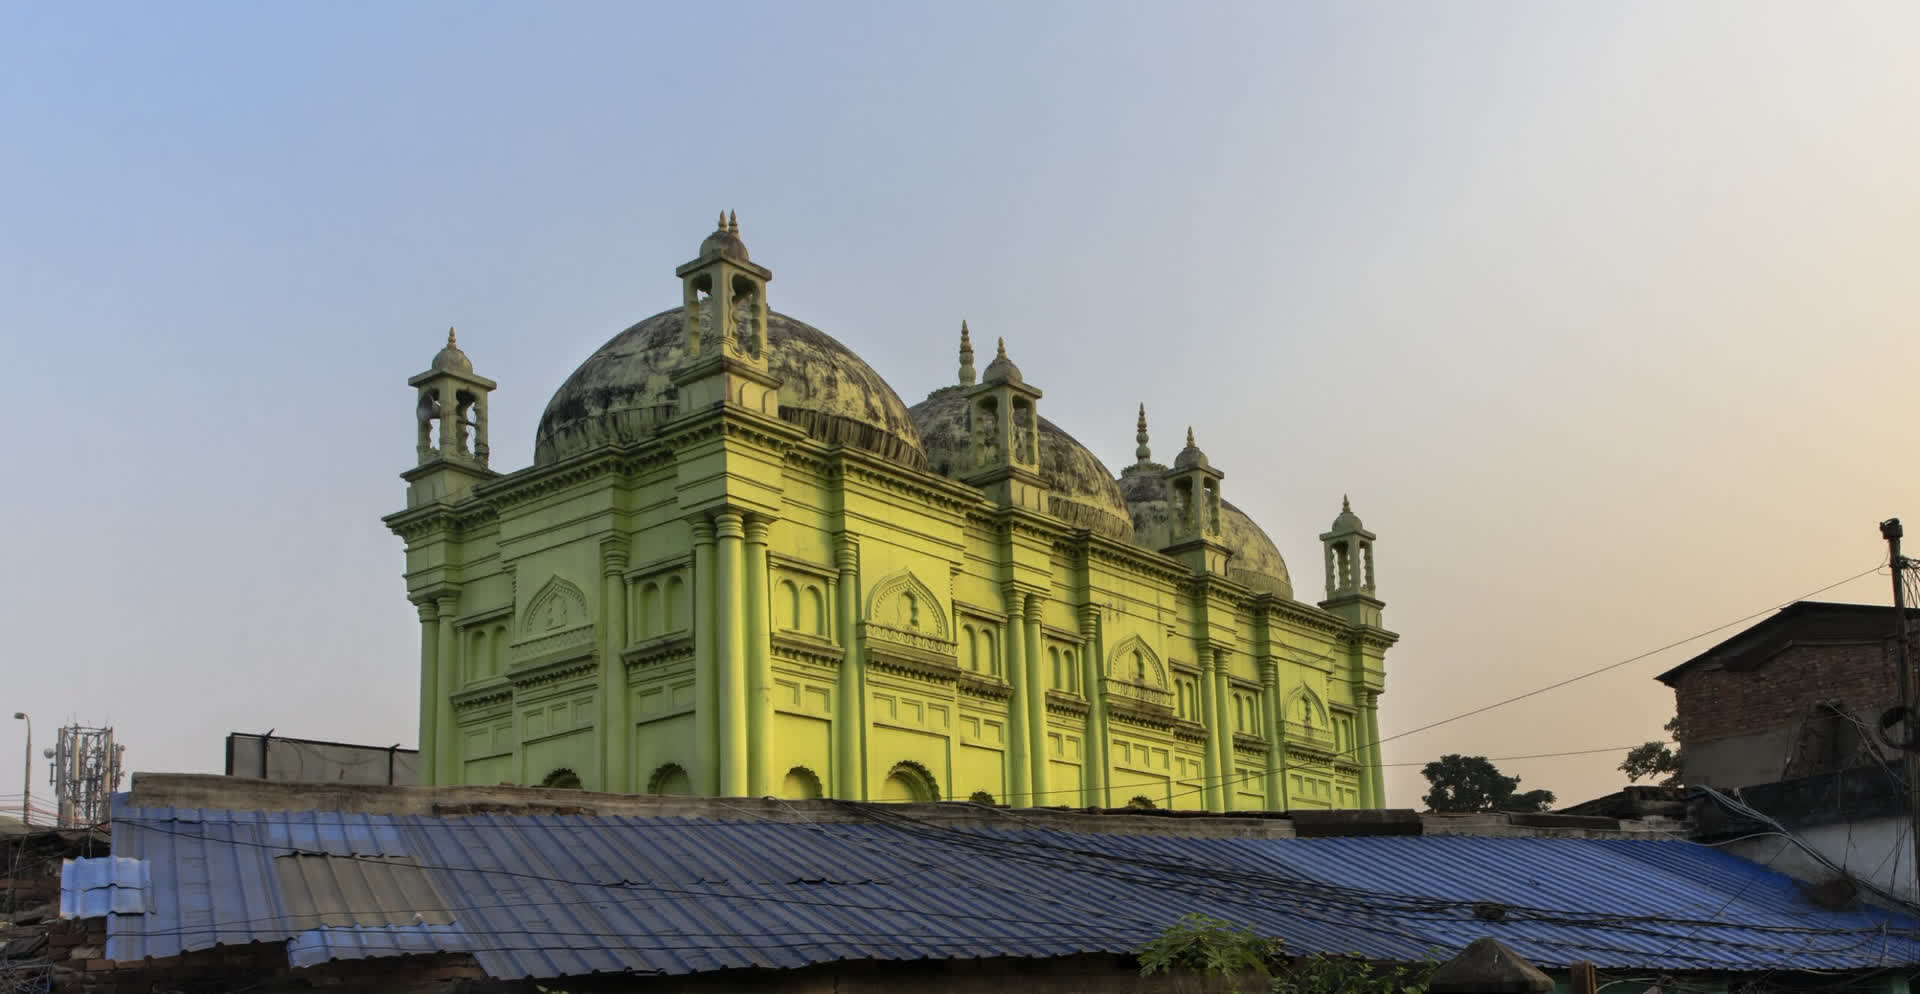 Basri Shah Masjid: Kolkata's Oldest Mosque